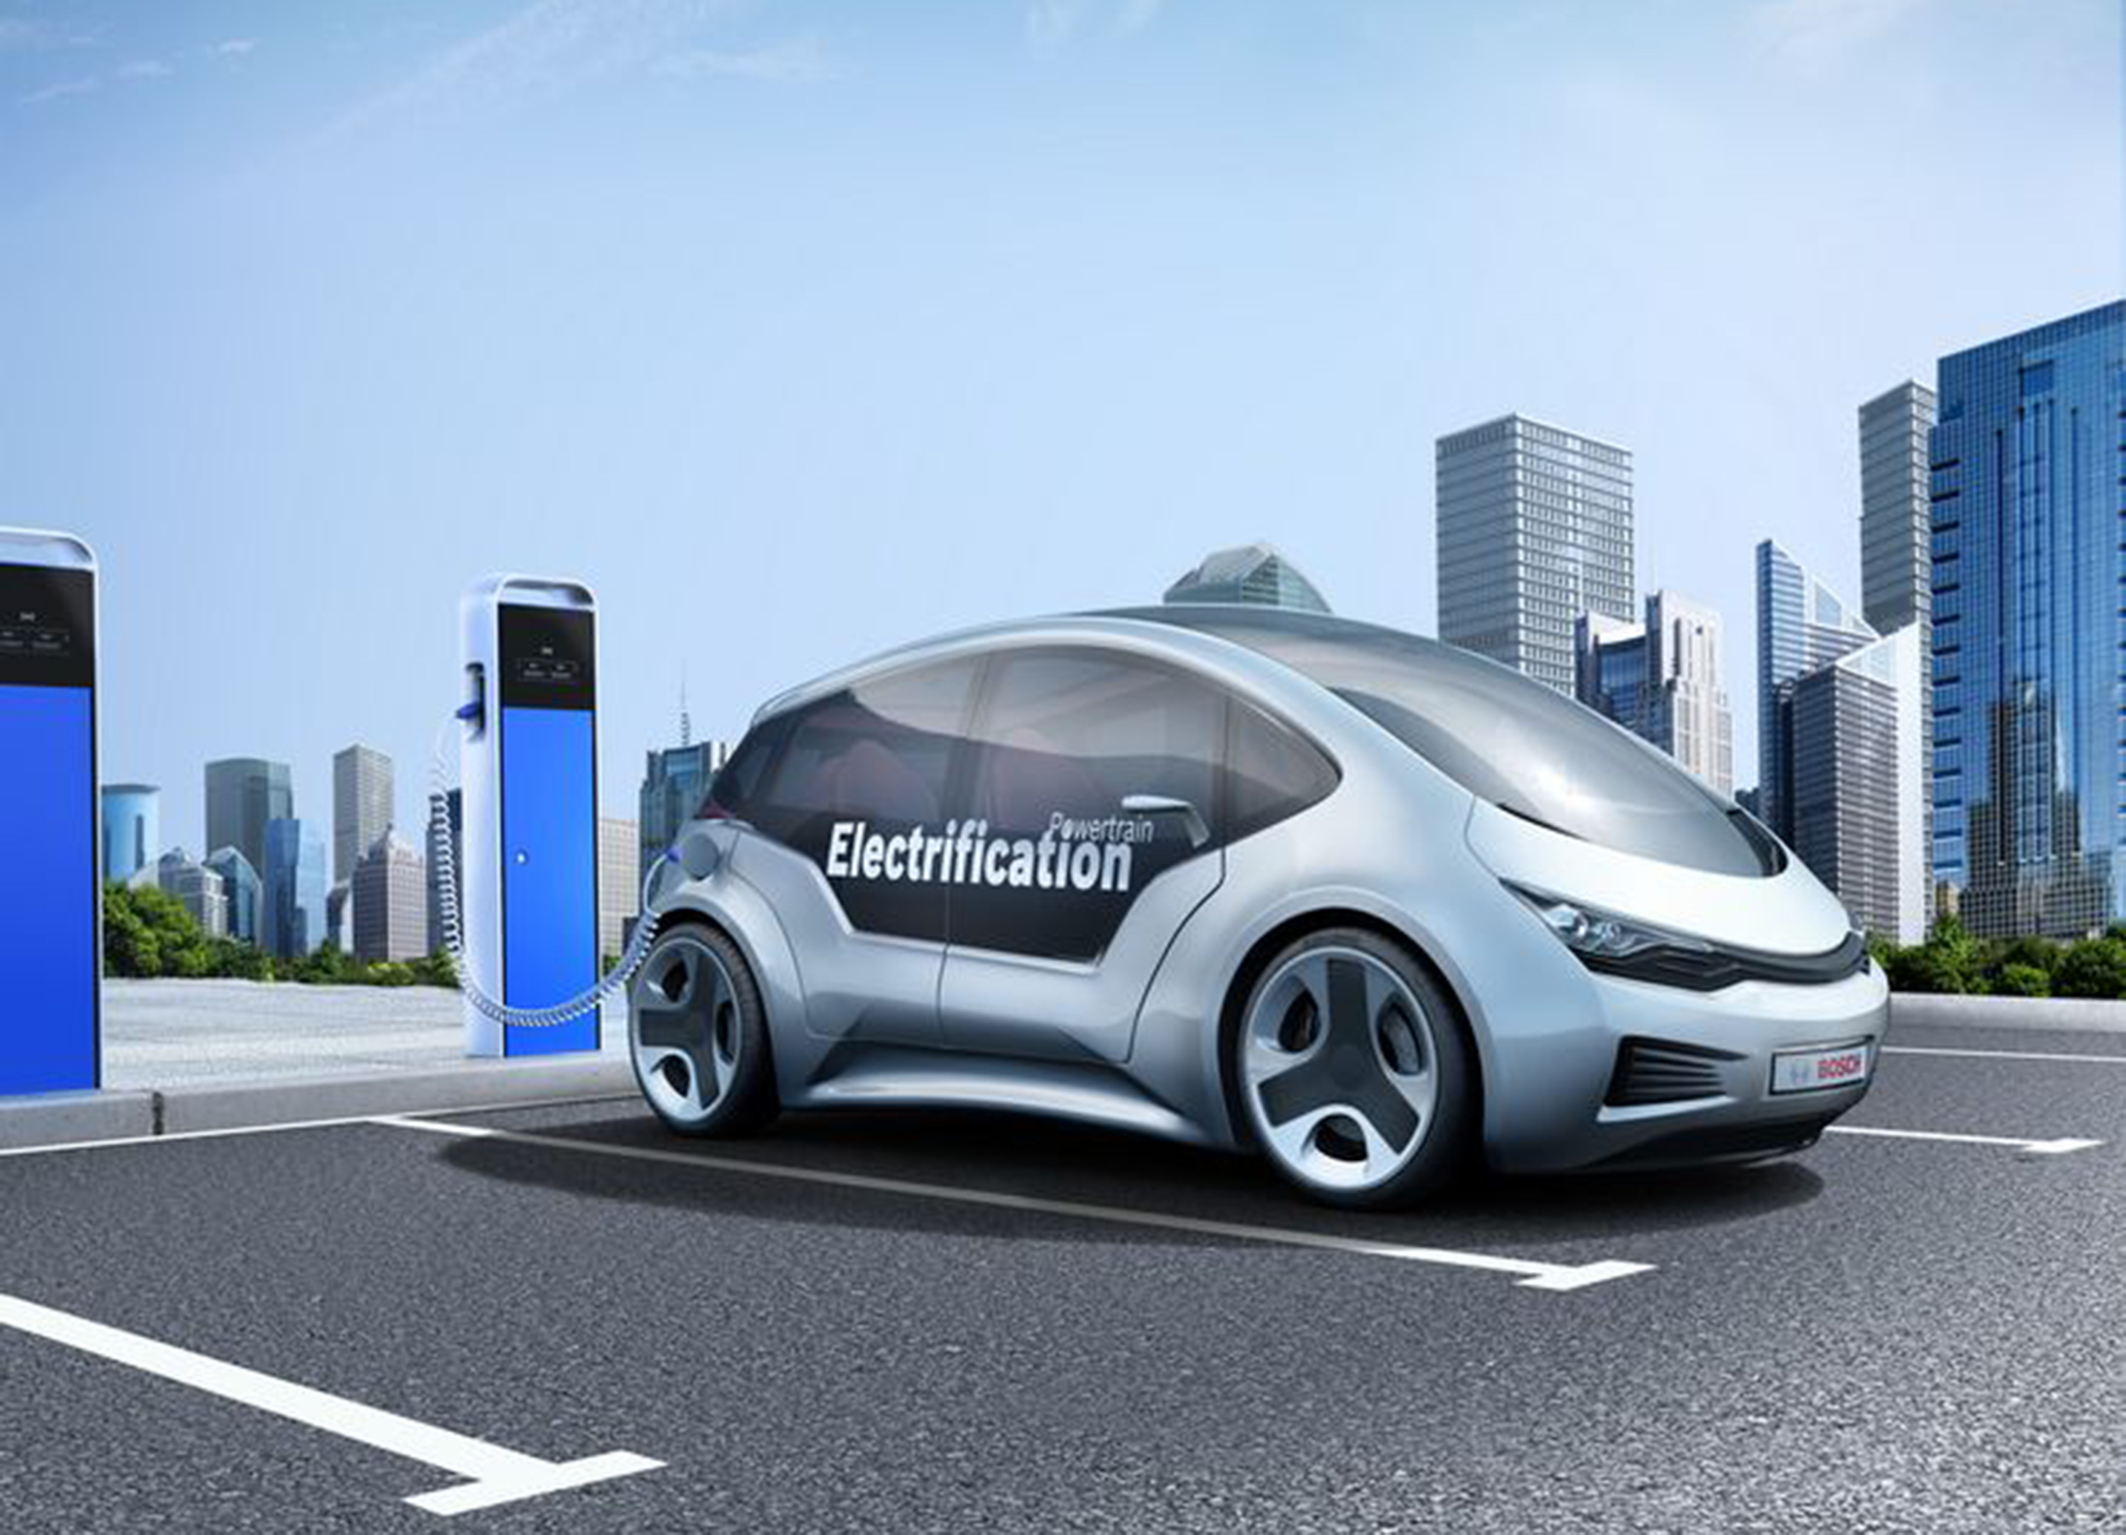 Bosch entra nel business del car sharing con i furgoni elettrici